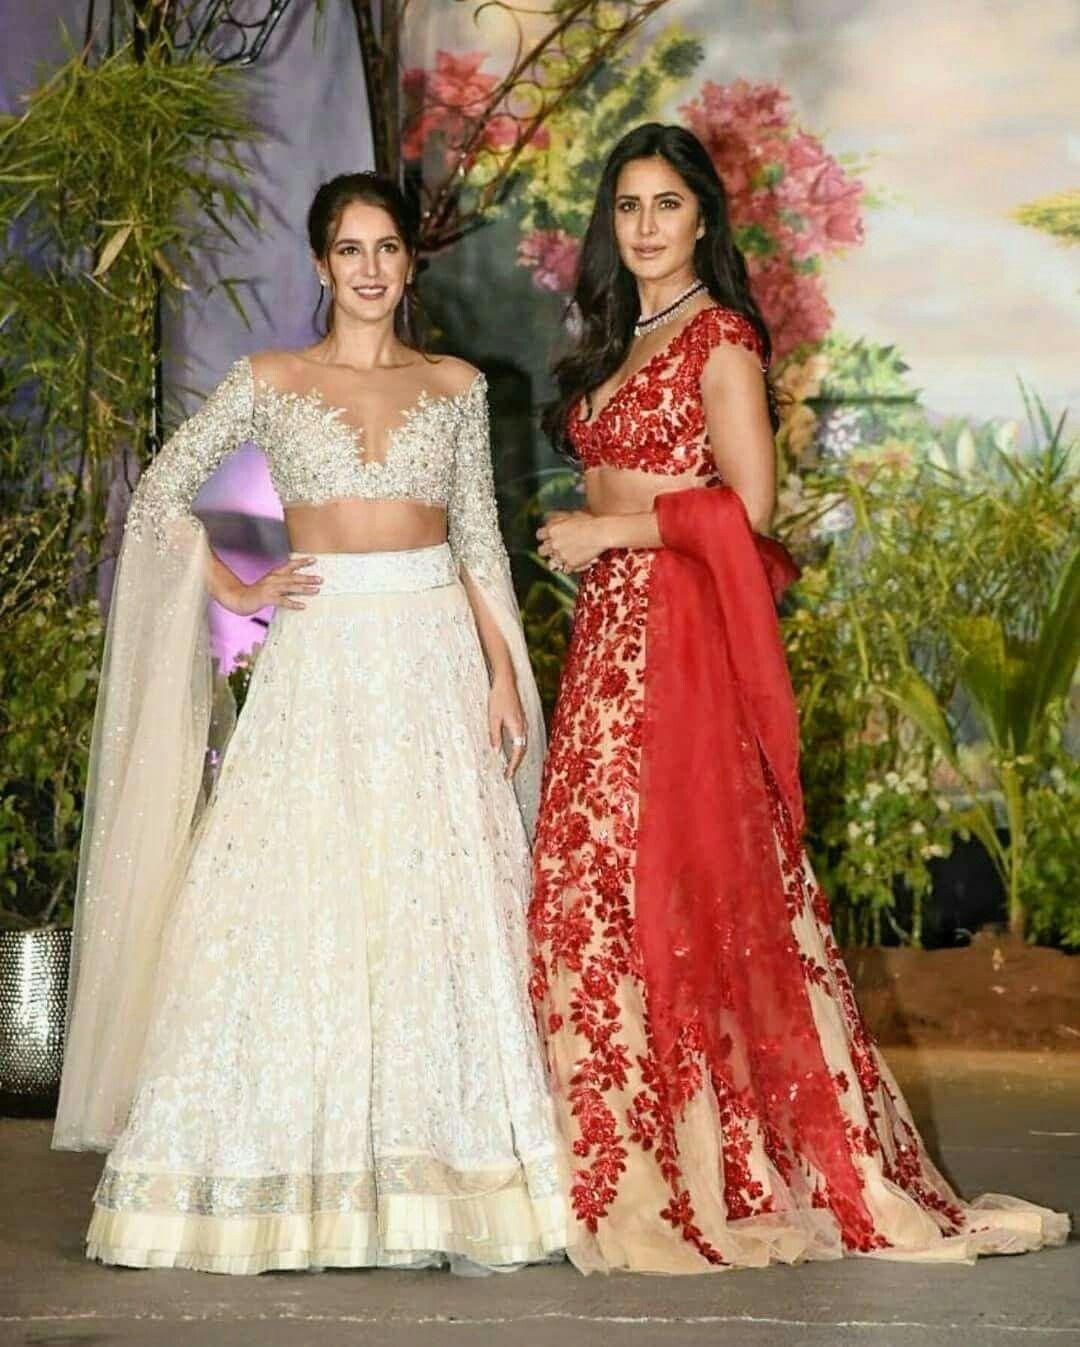 Katrina Kaif With Isebell Kaif At Sonamahuja Wedding Fashion Show Dresses Indian Wedding Outfits Event Dresses